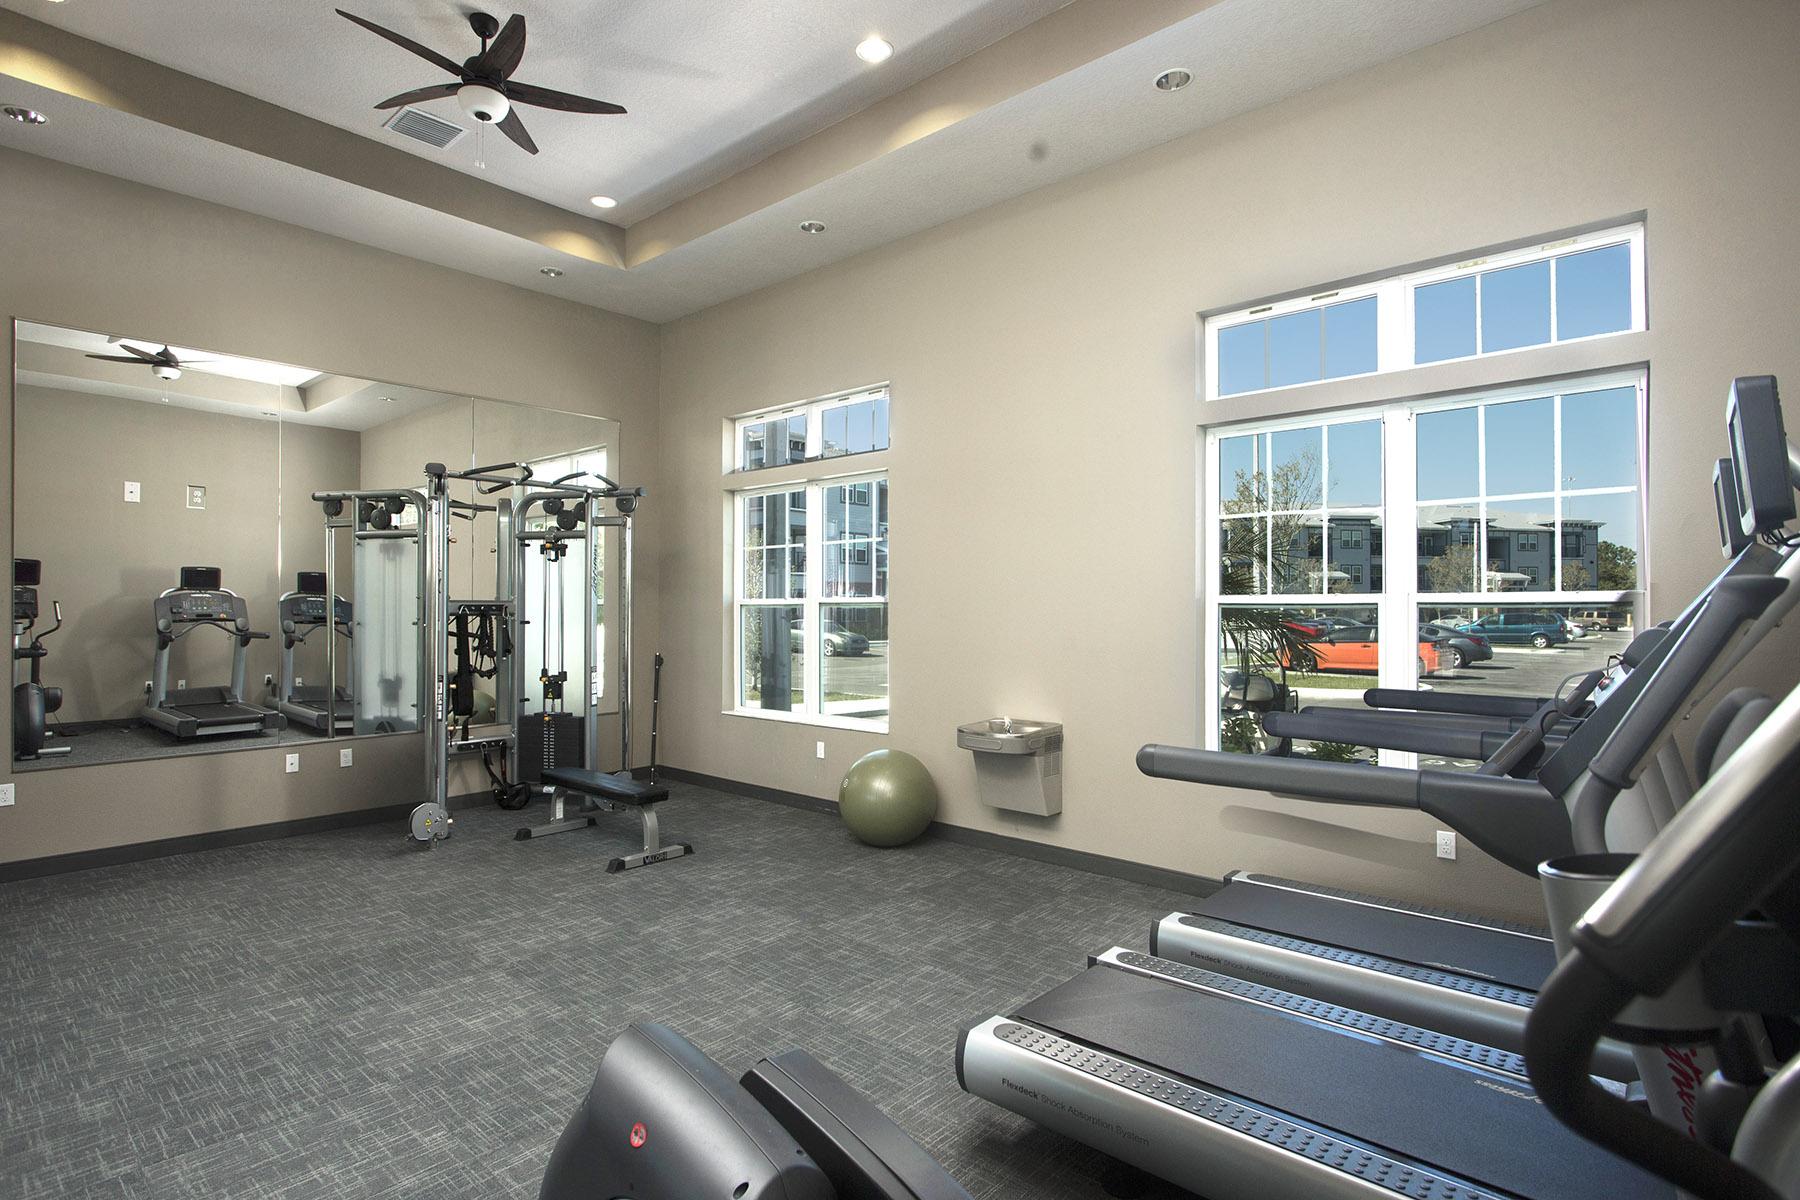 CharlestonEdge-Rental-Apartment-Brandon-Tampa-Florida-Pool-Bedrooms-Fitness-Center-Gym